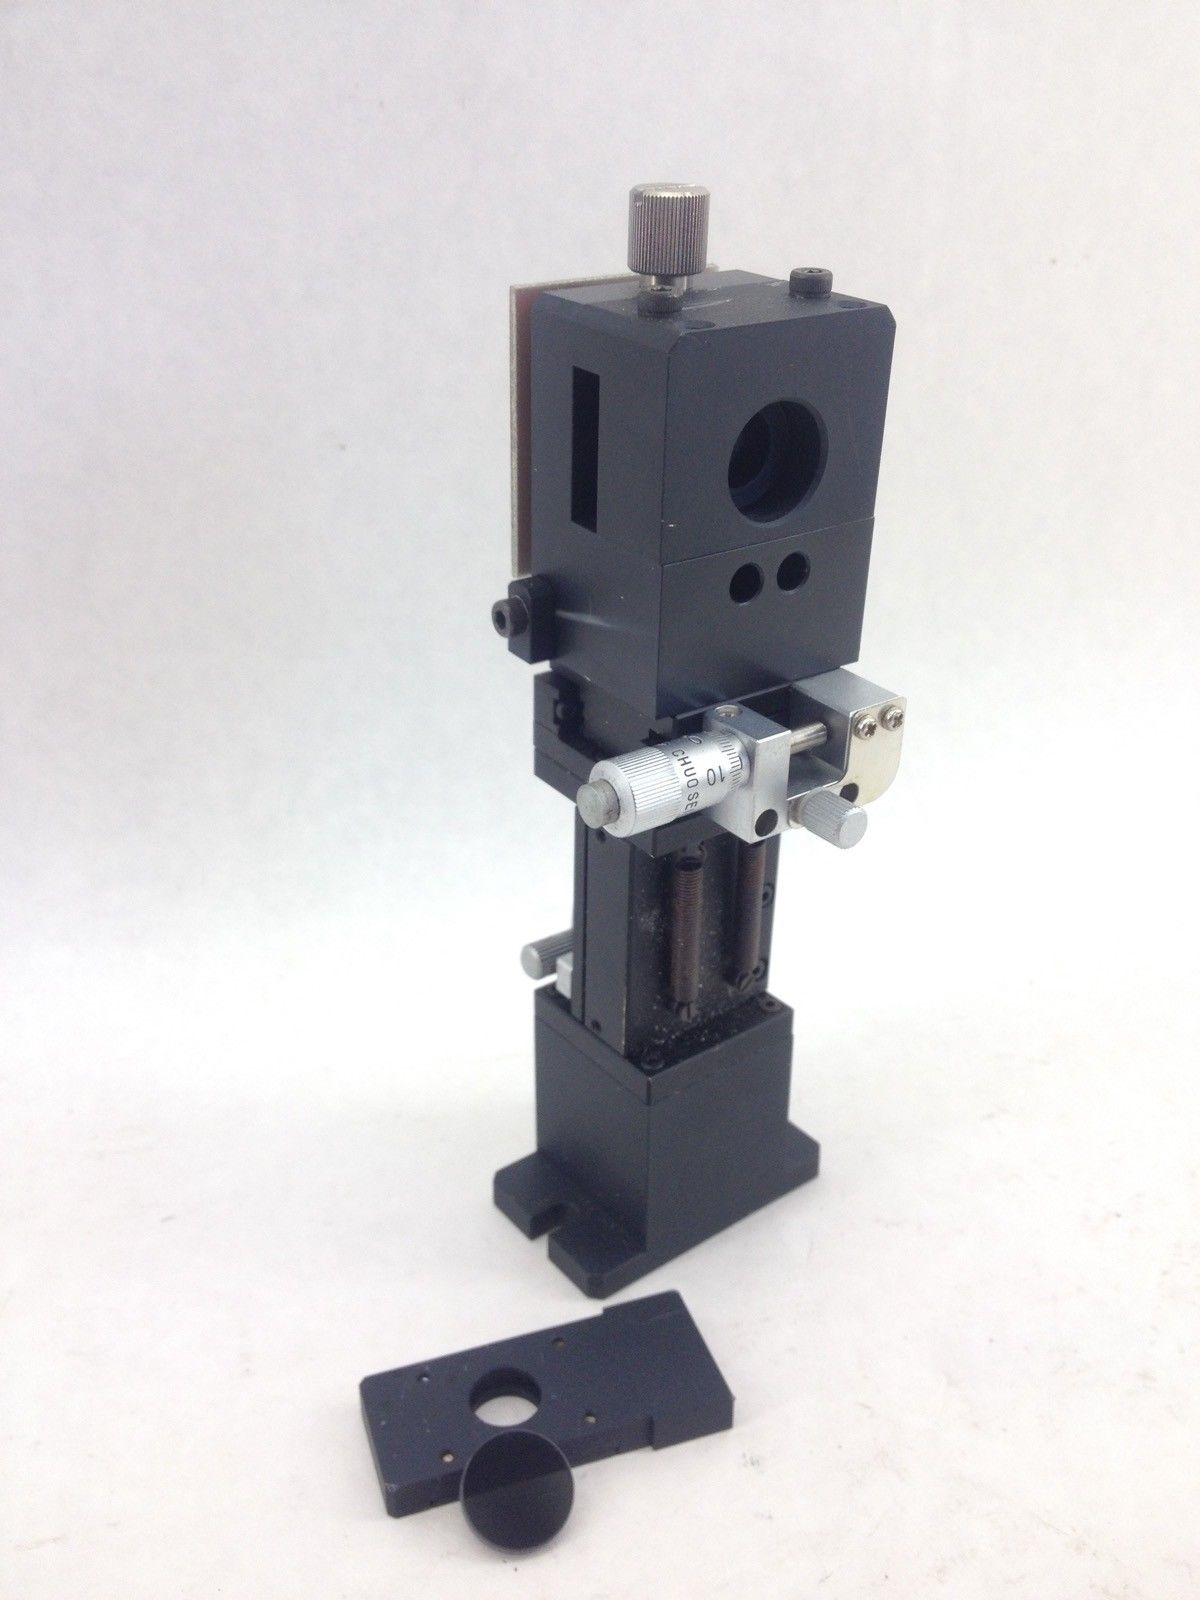 021128 MICRO-CONTROLLER BOARD OPTOMECHANICAL ASSY (H330) 1